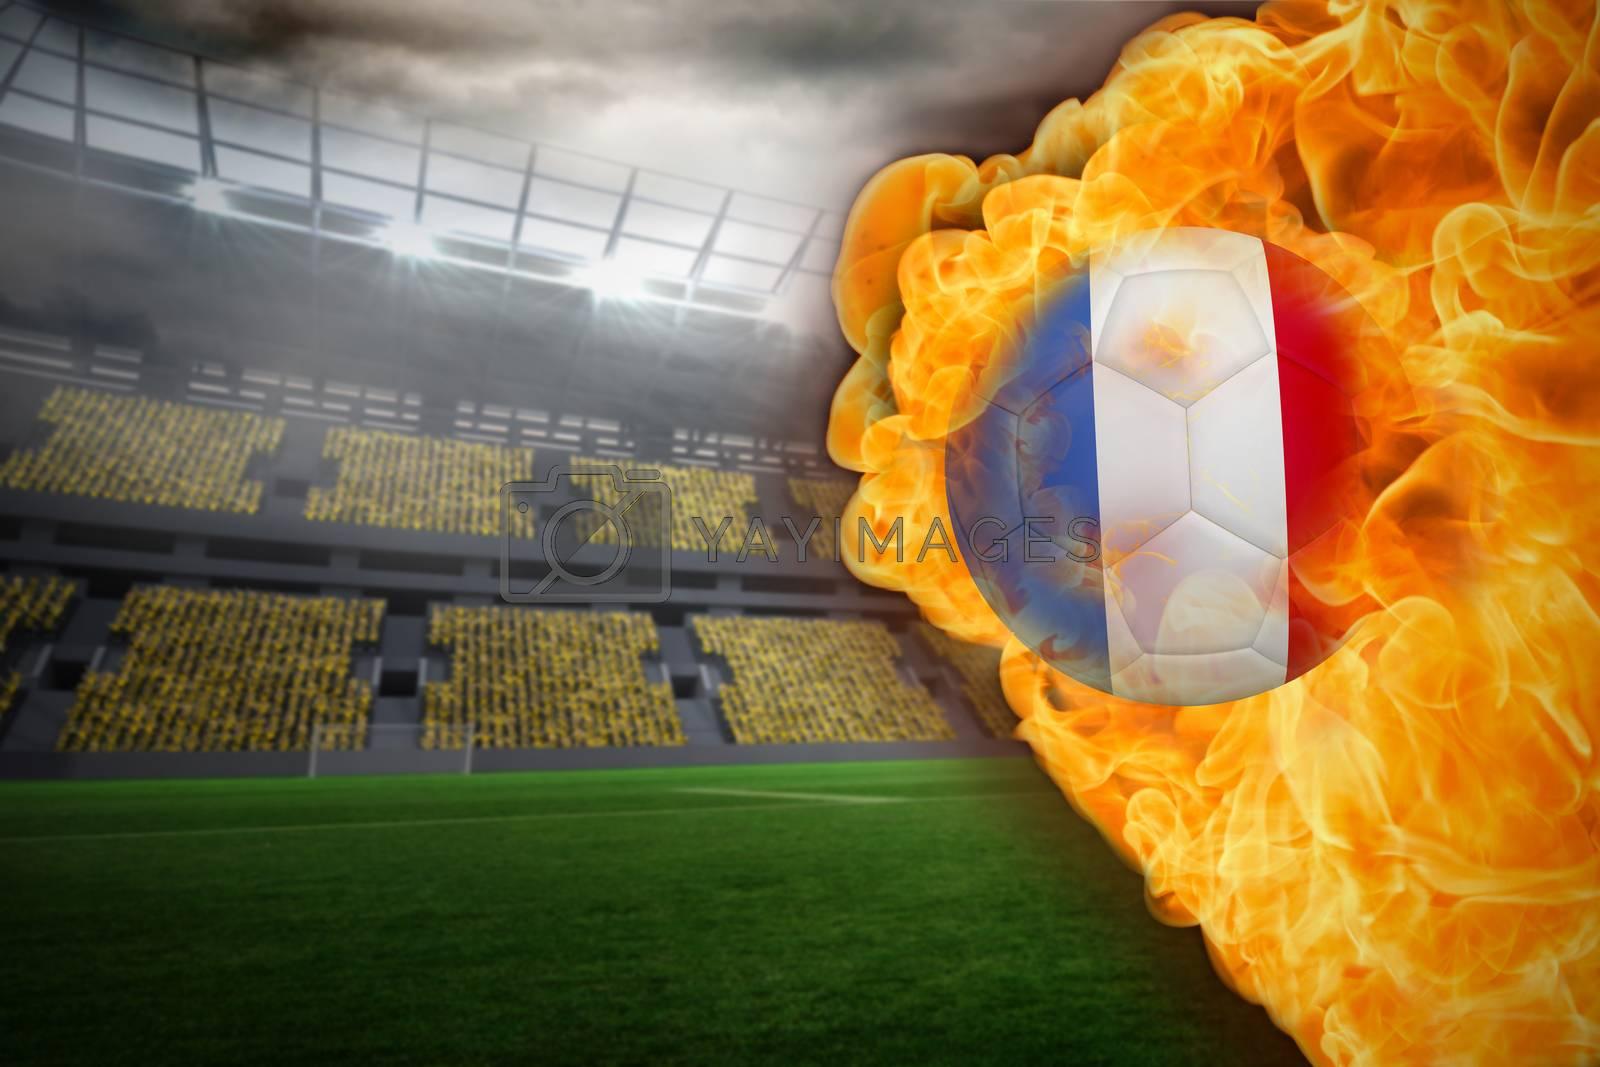 Fire surrounding france flag football by Wavebreakmedia